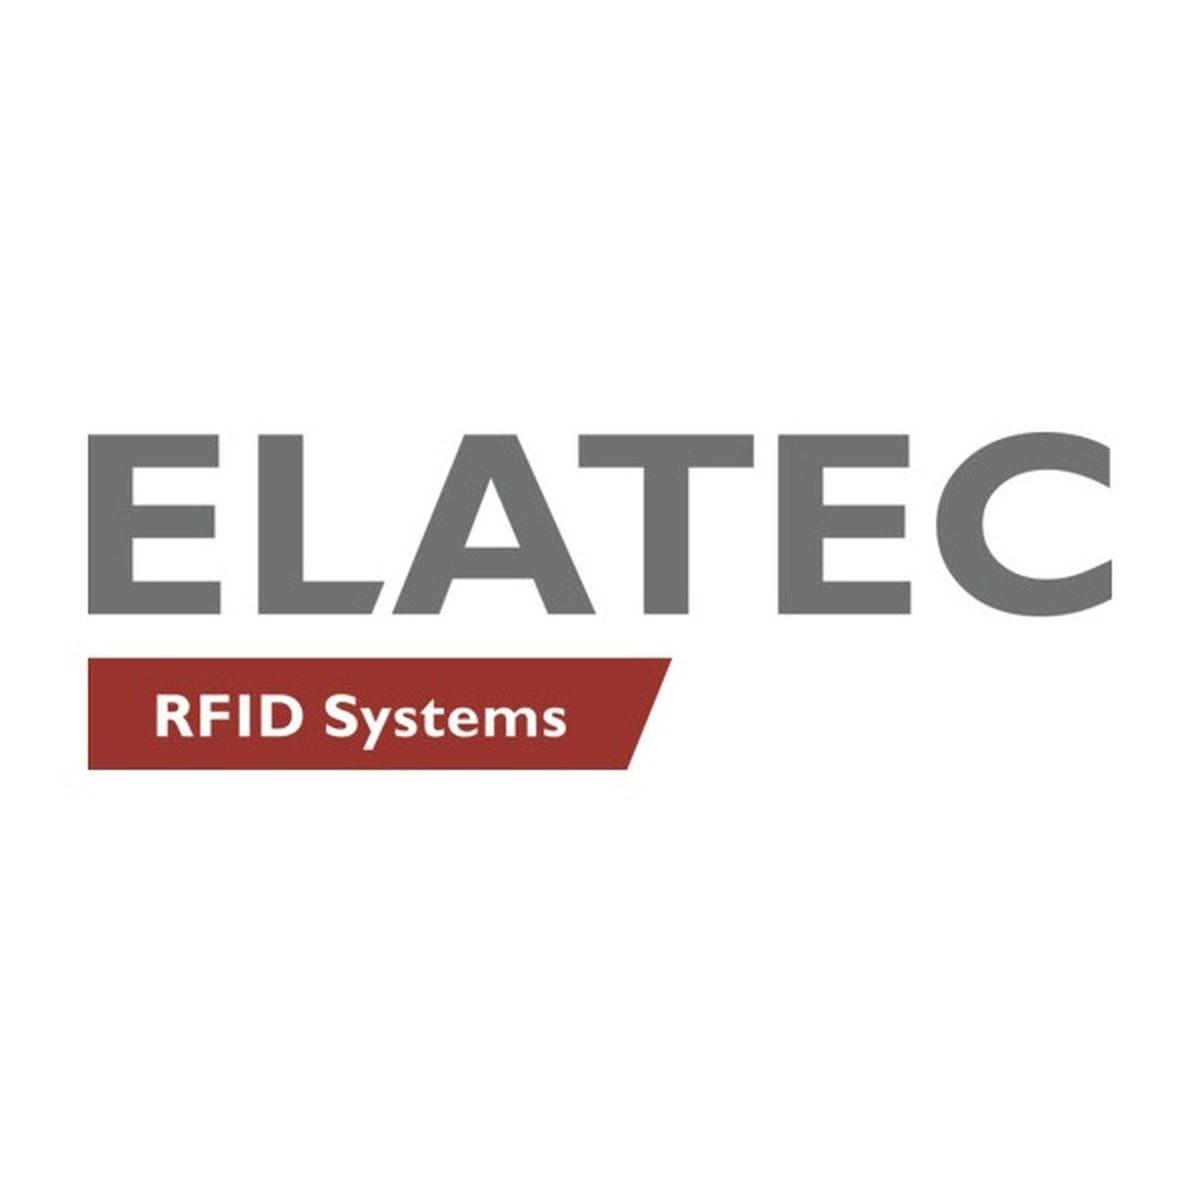 ELATEC GmbH